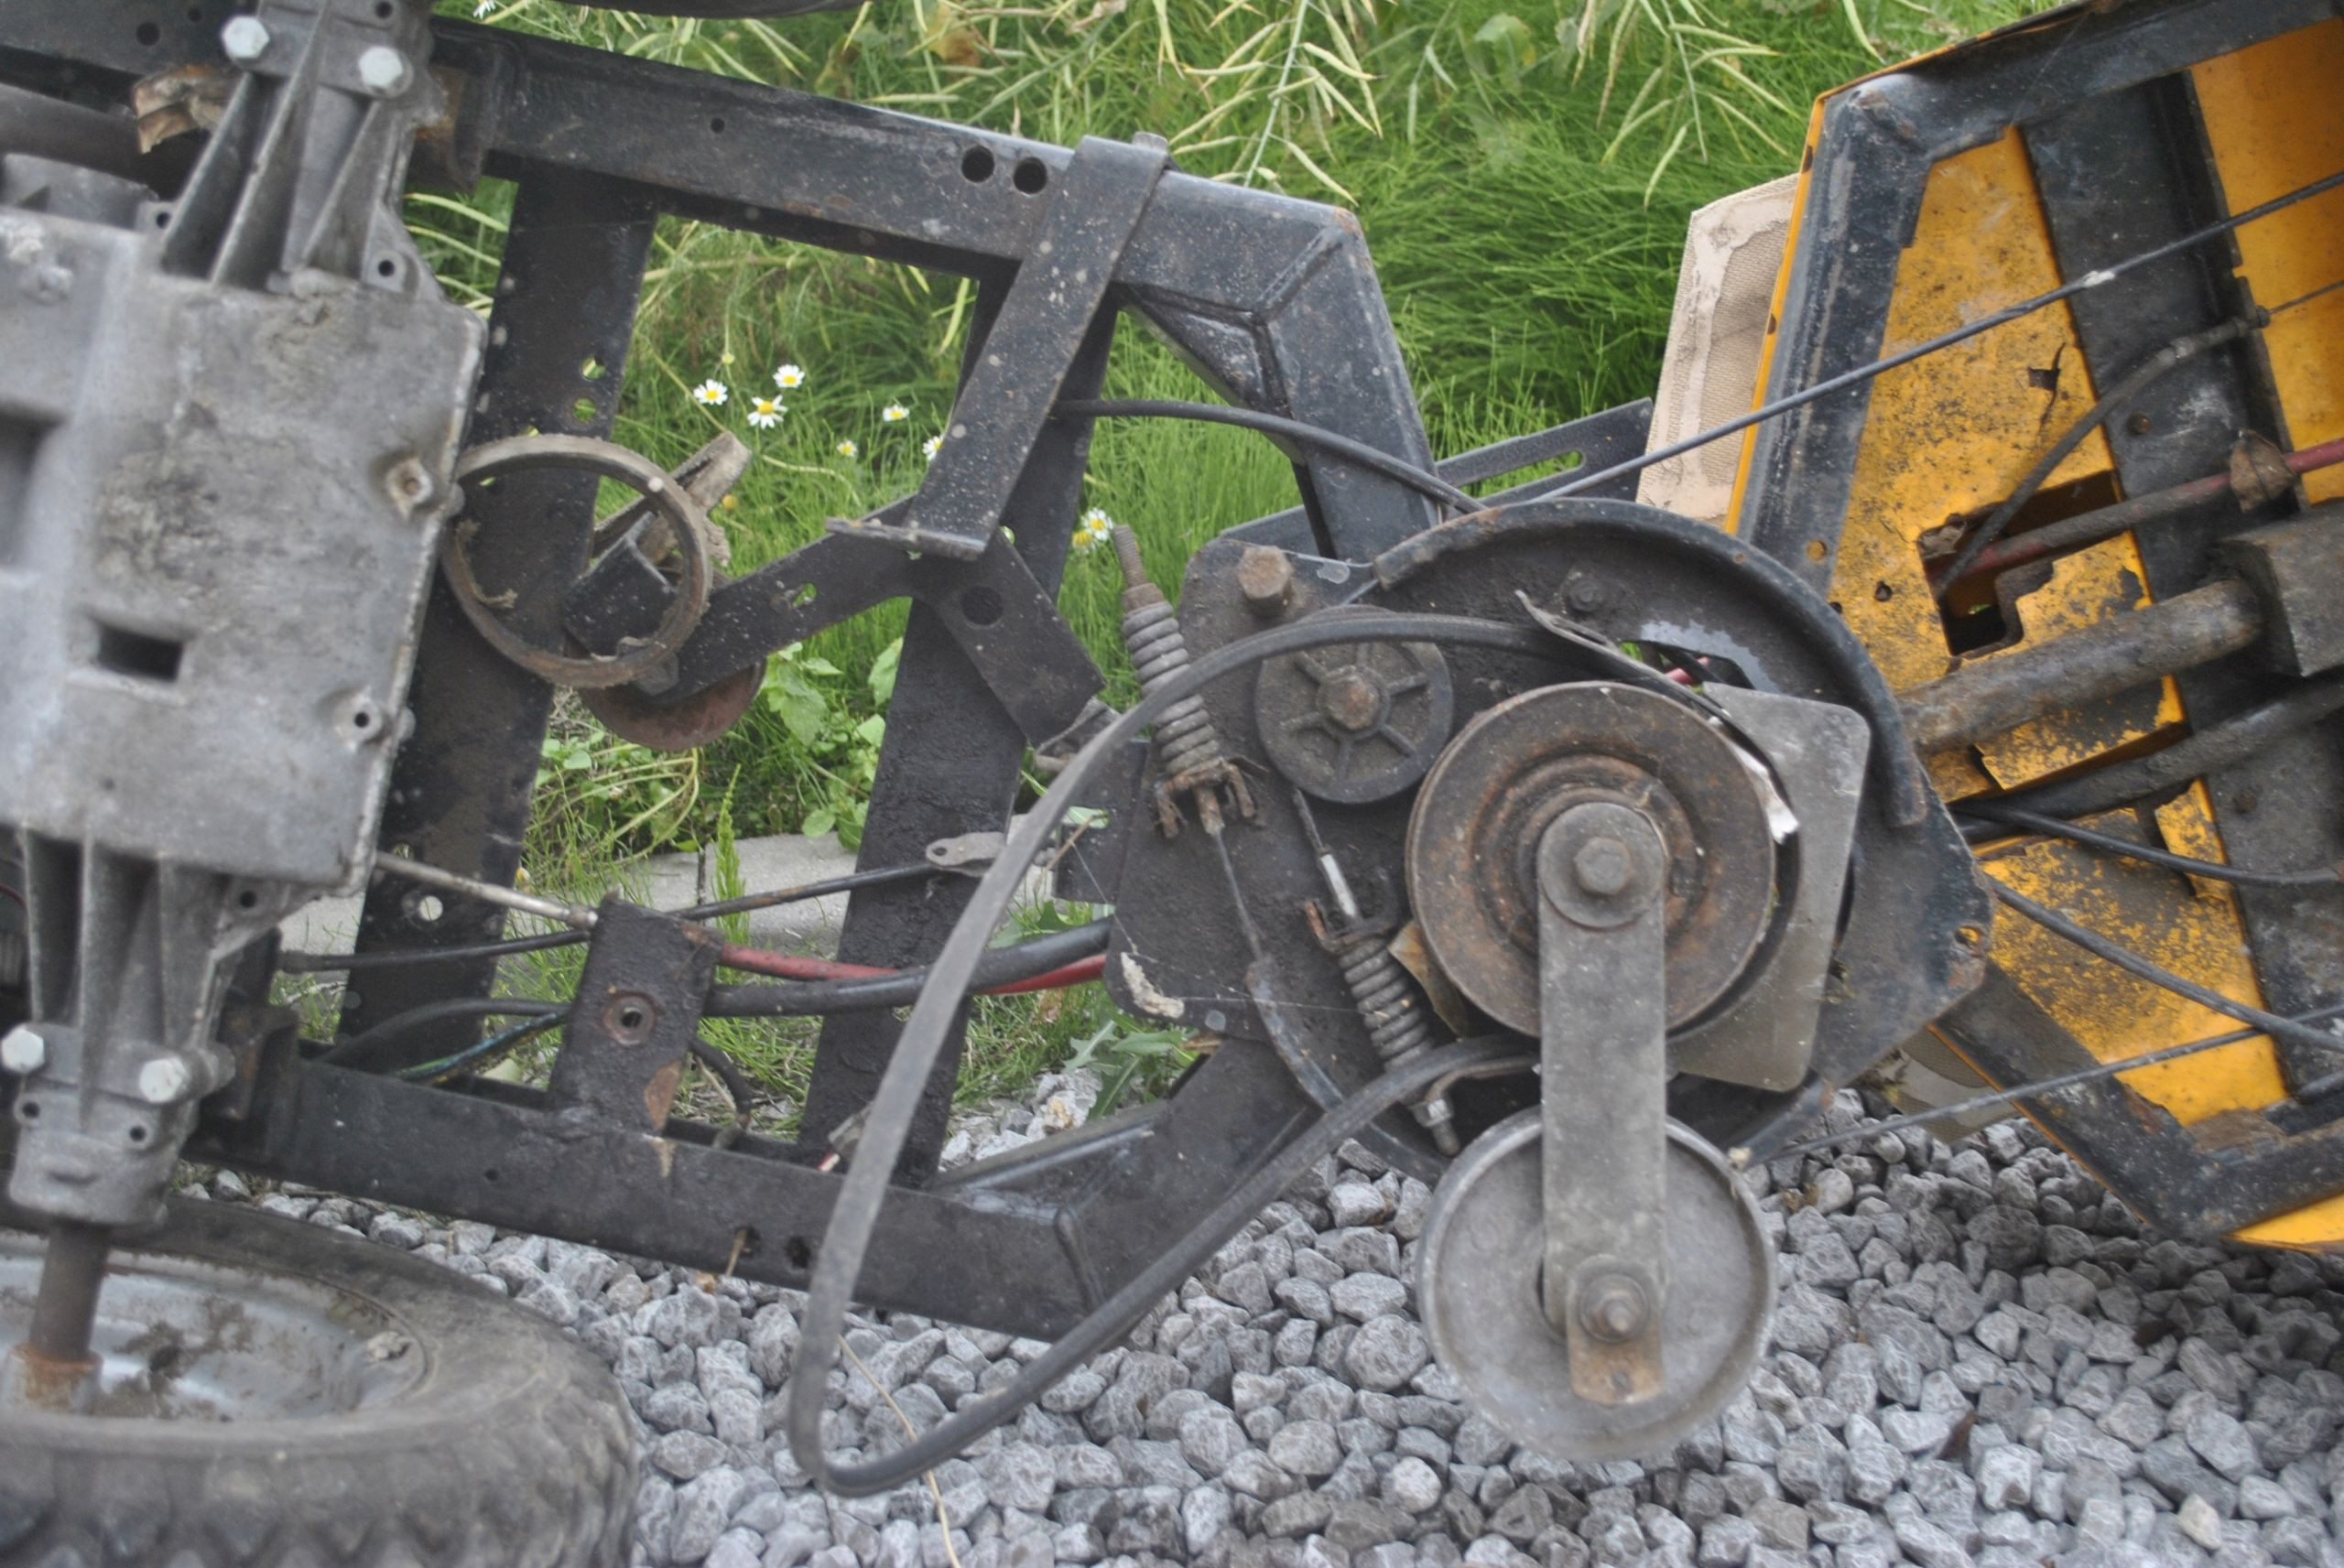 Traktorek Kosiarka Stiga Park 3 Noze Aukcja Bcm 7465947902 Oficjalne Archiwum Allegro Park Cannon Guns